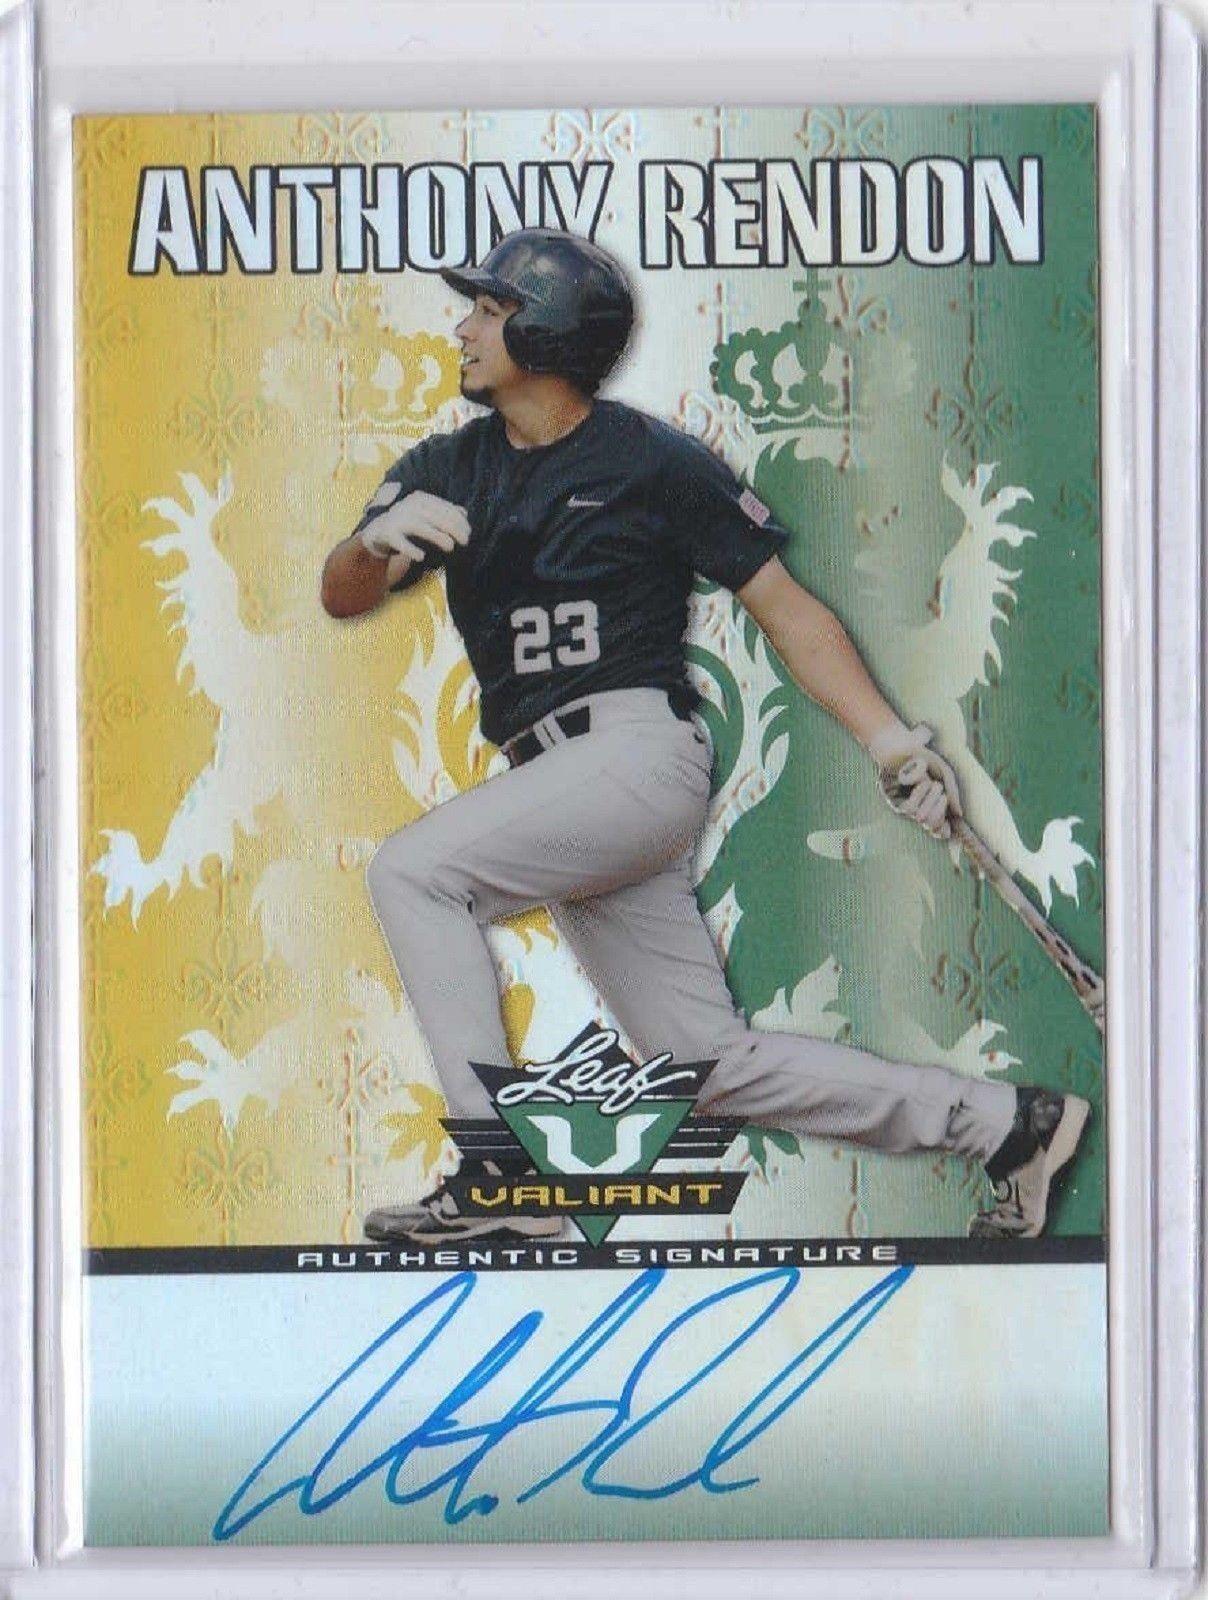 2011 Leaf Valiant Draft #AR1 Anthony Rendon